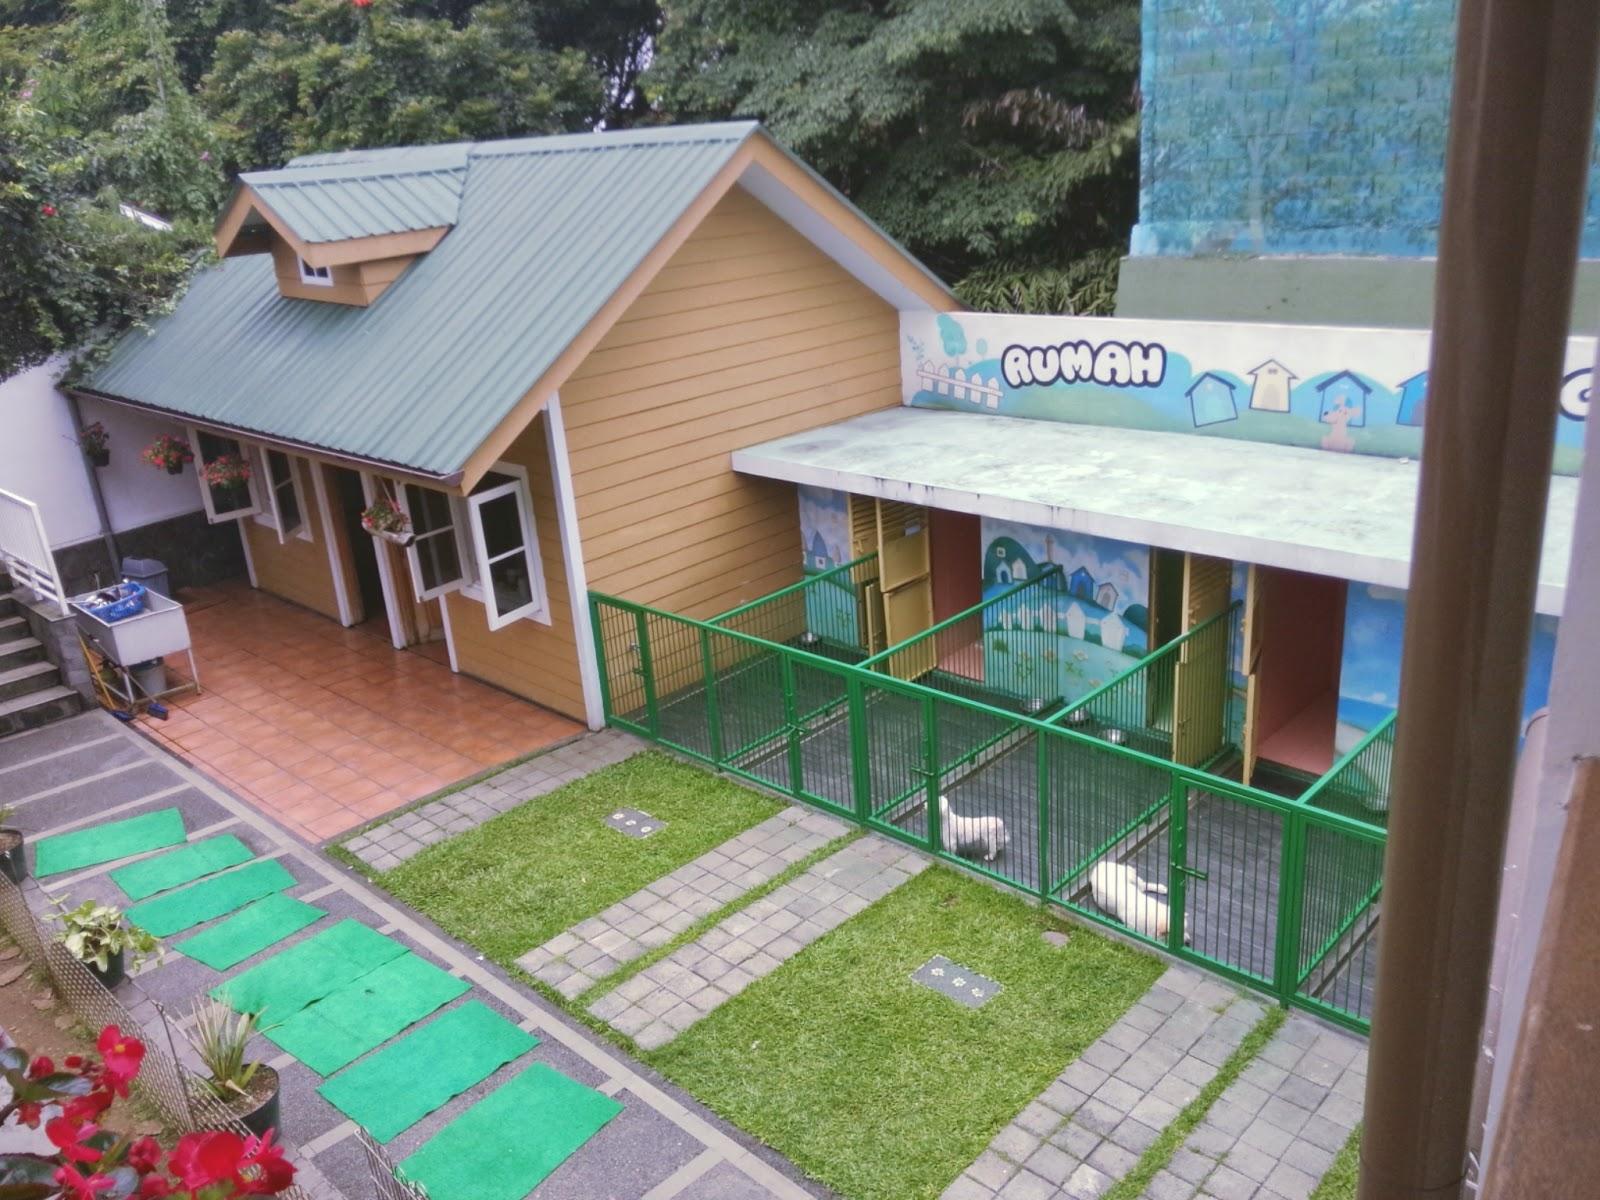 My Lovely Samoyed Review Of Rumah Guguk Petshop In Bandung